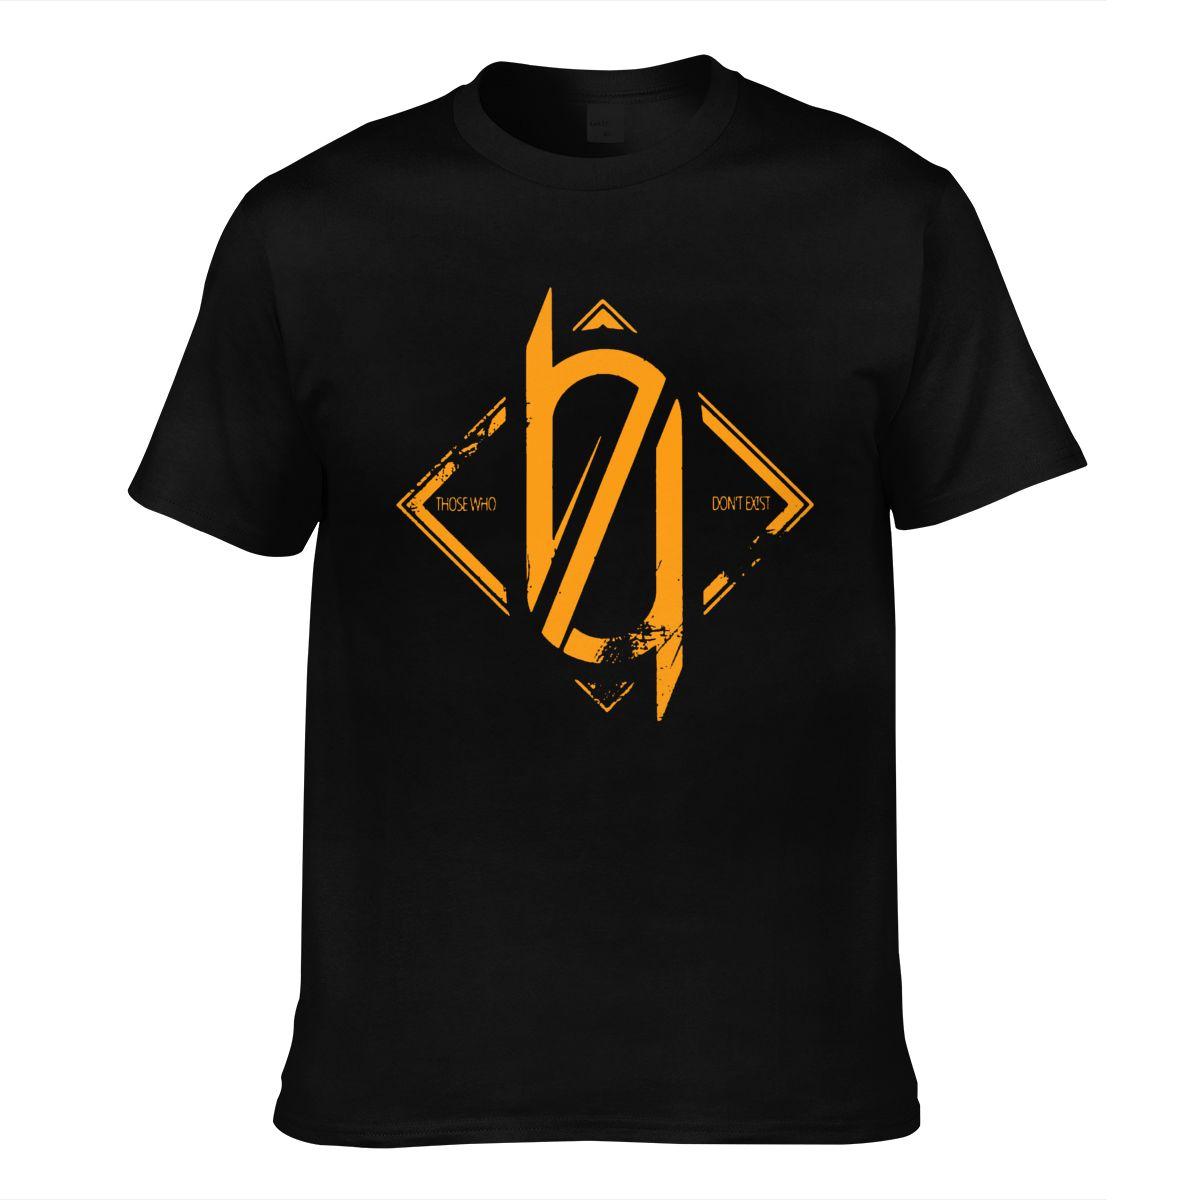 Camiseta de manga corta para hombre y niña, camiseta Unisex de primera línea 404 Squad (Scratch), camiseta para mujer, Camiseta de algodón Cn(origin)